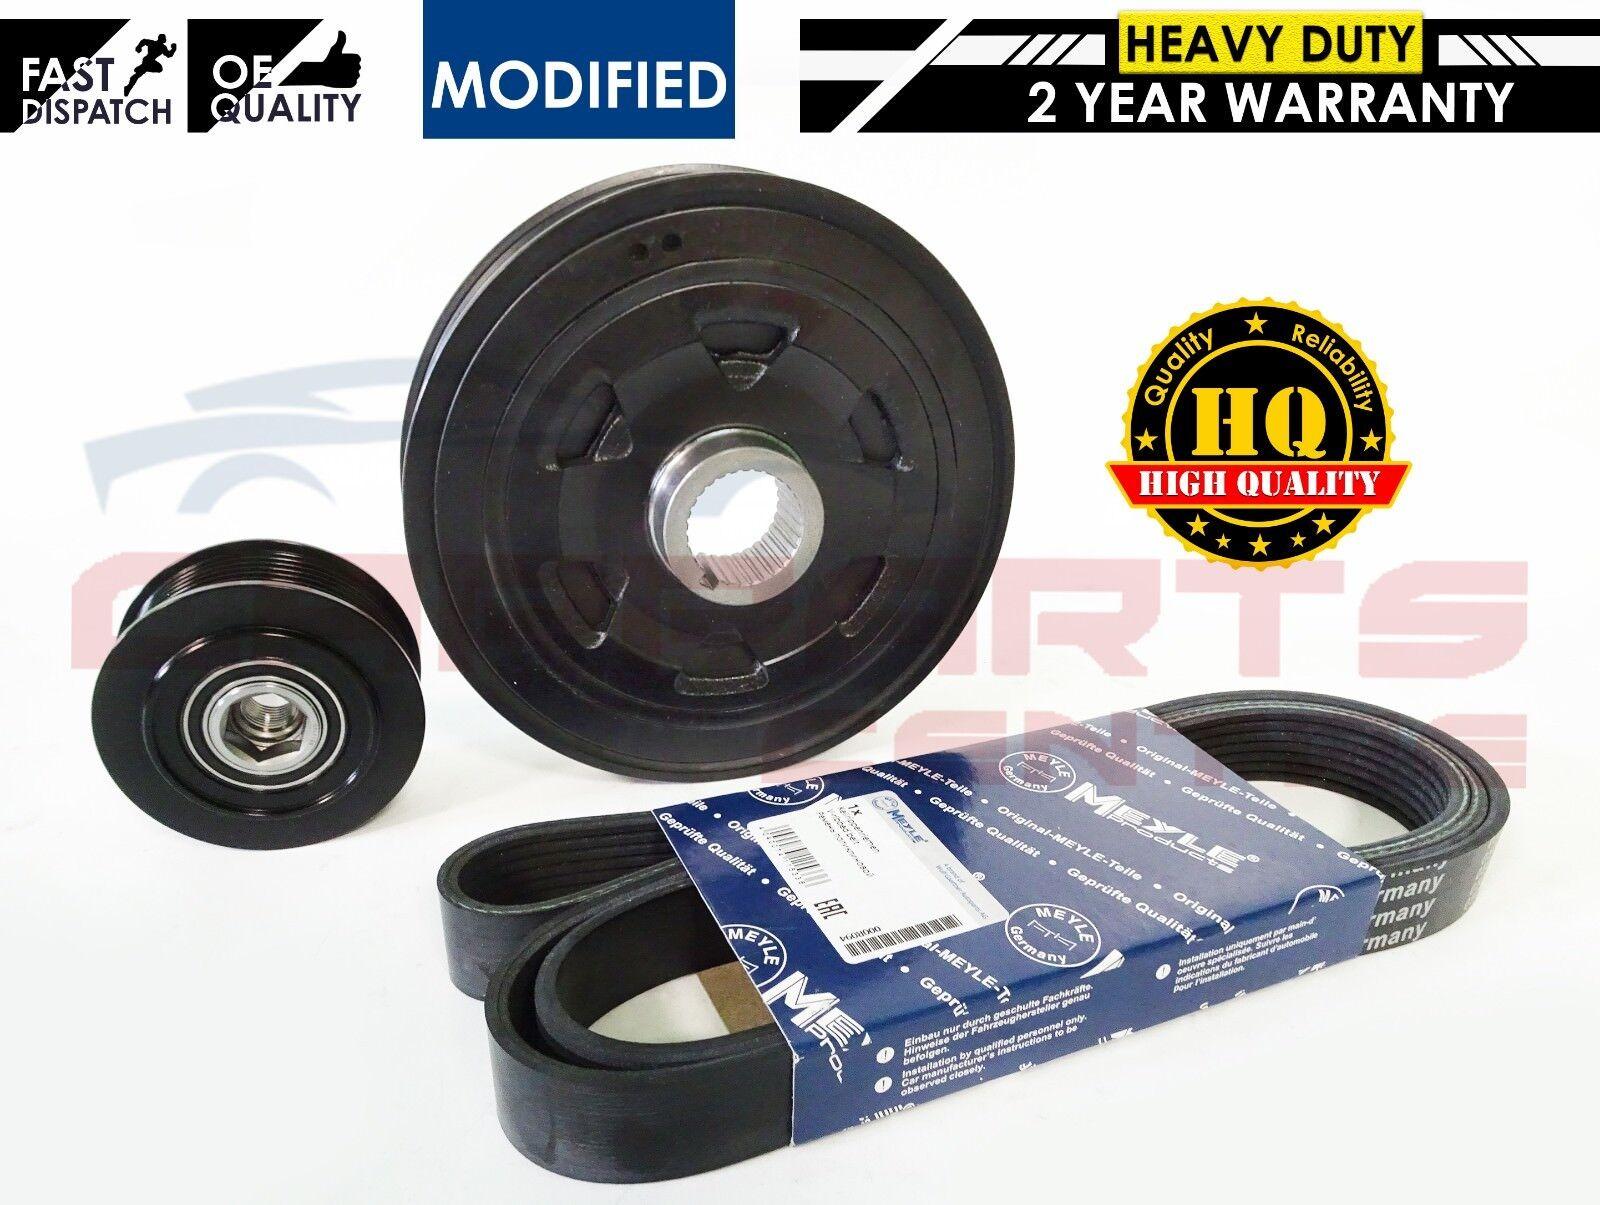 Fits Honda FR-V 2.2i CTDi Genuine Mintex Rear Brake Pad Fitting Kit